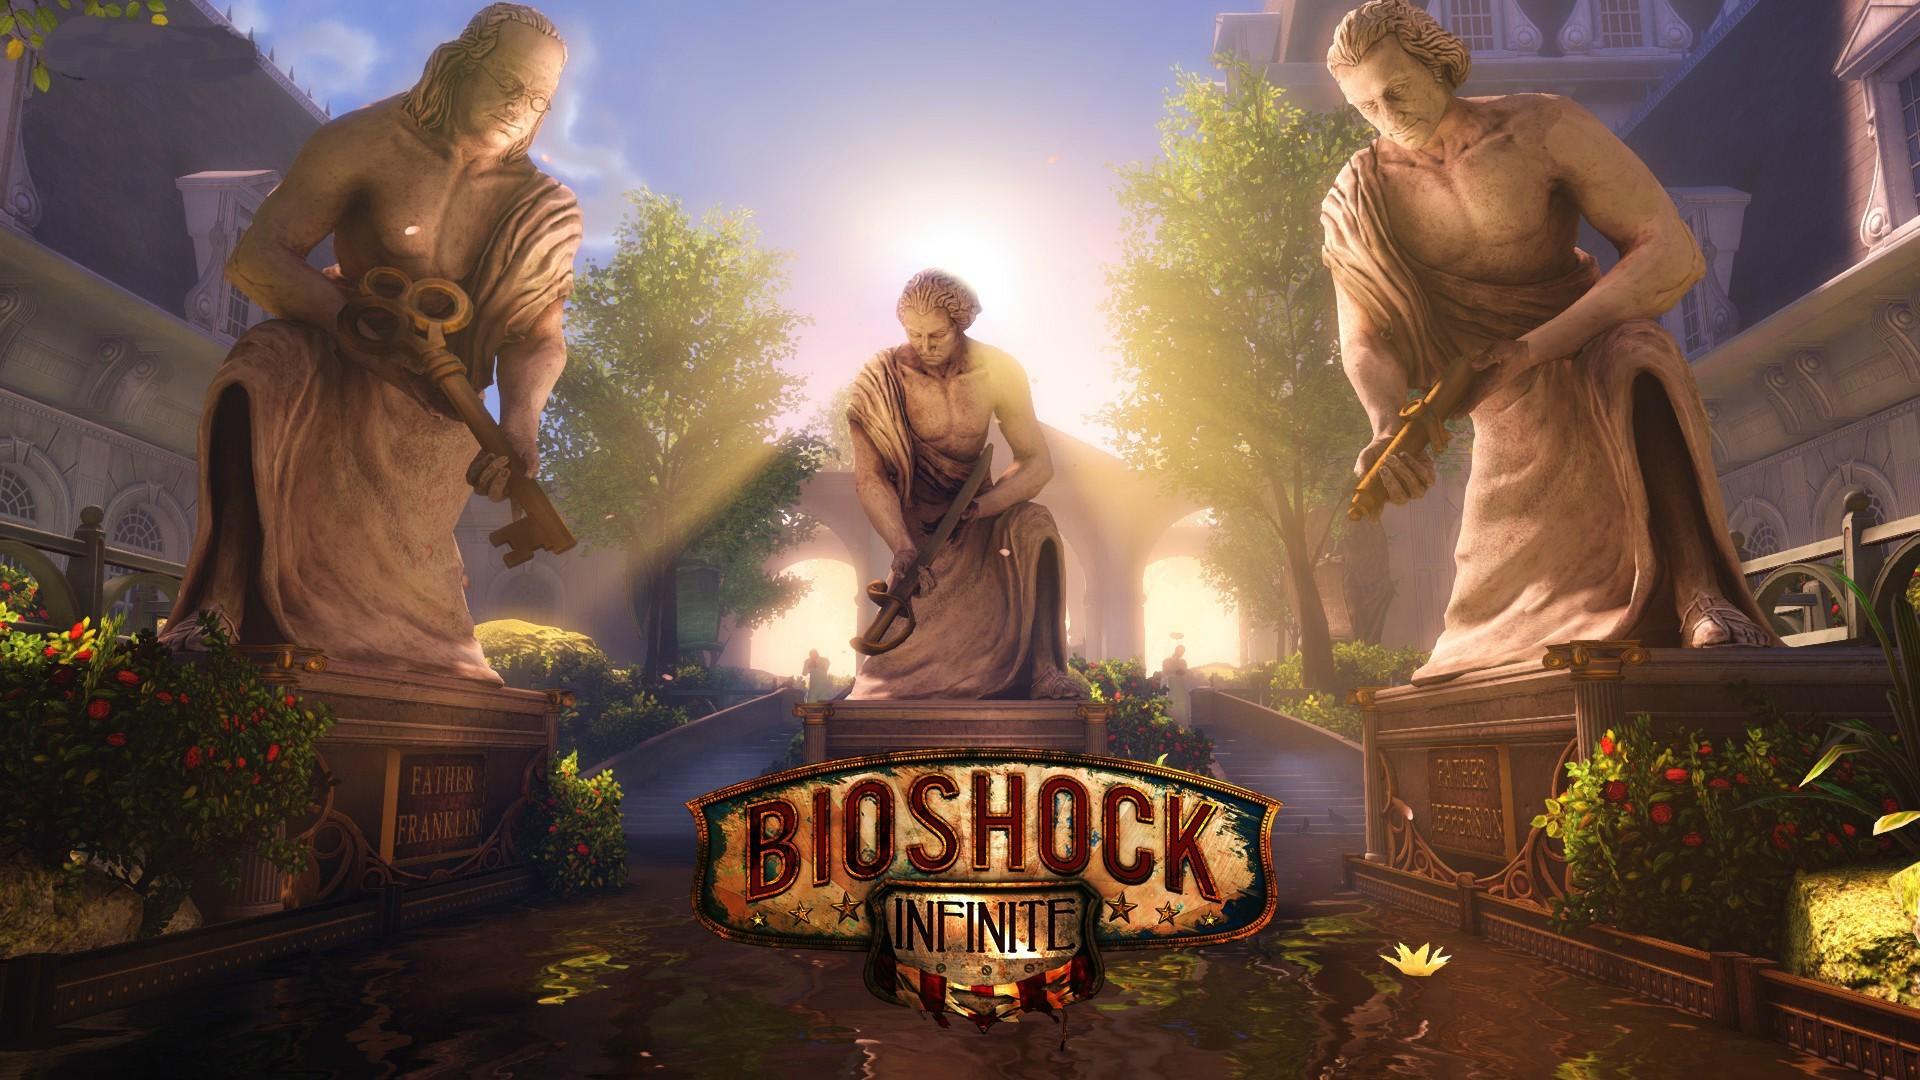 Bioshock Infinite Songbird Wallpaper by LeagueWallpapers 1024×576 Bioshock  Infinite Wallpaper (36 Wallpapers)